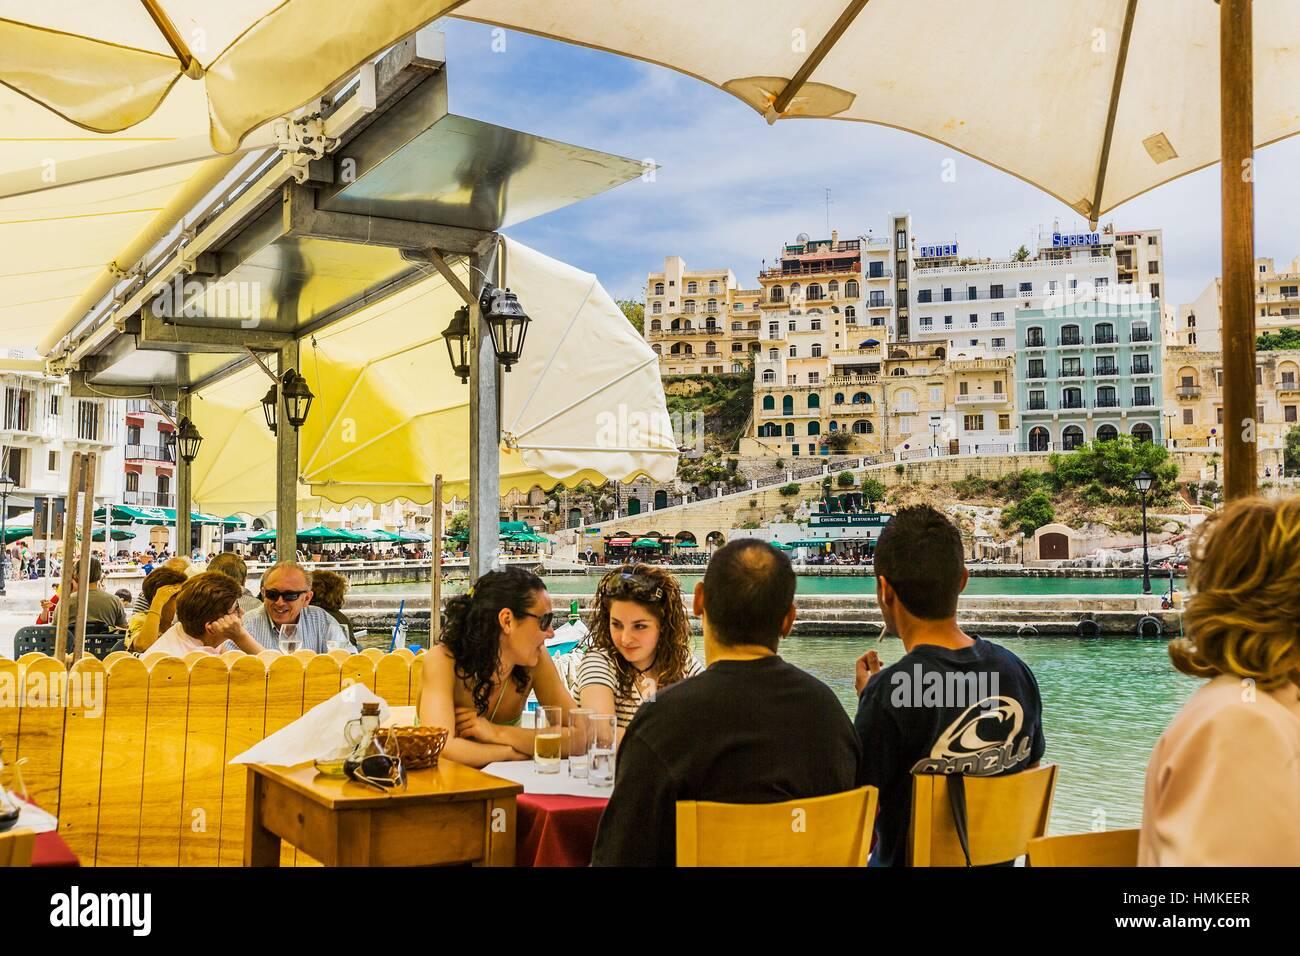 Eating in a restaurant near the village, Xlendi, Gozo, Malta - Stock Image